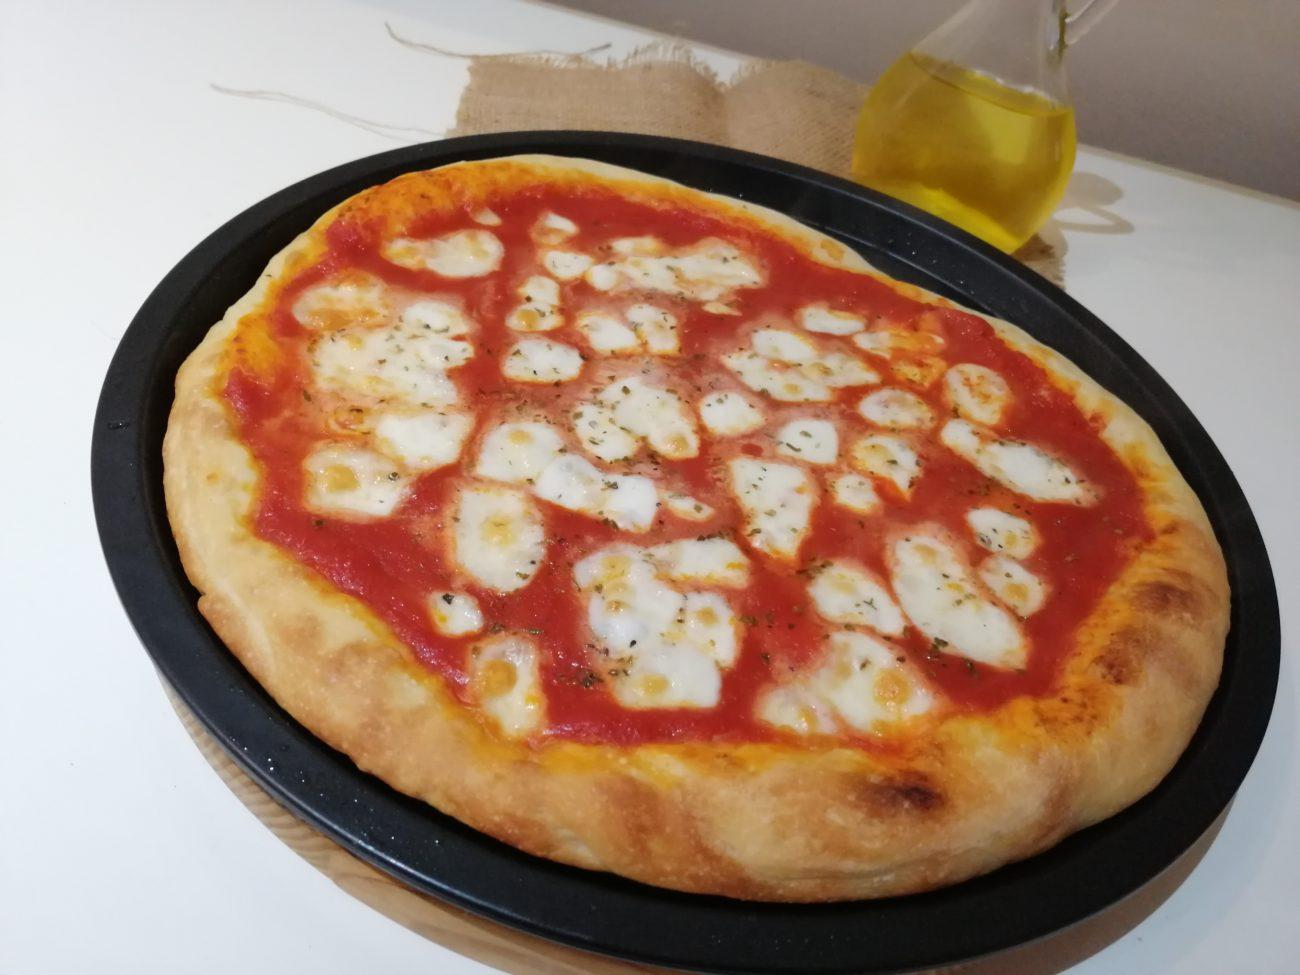 La pizza casalinga